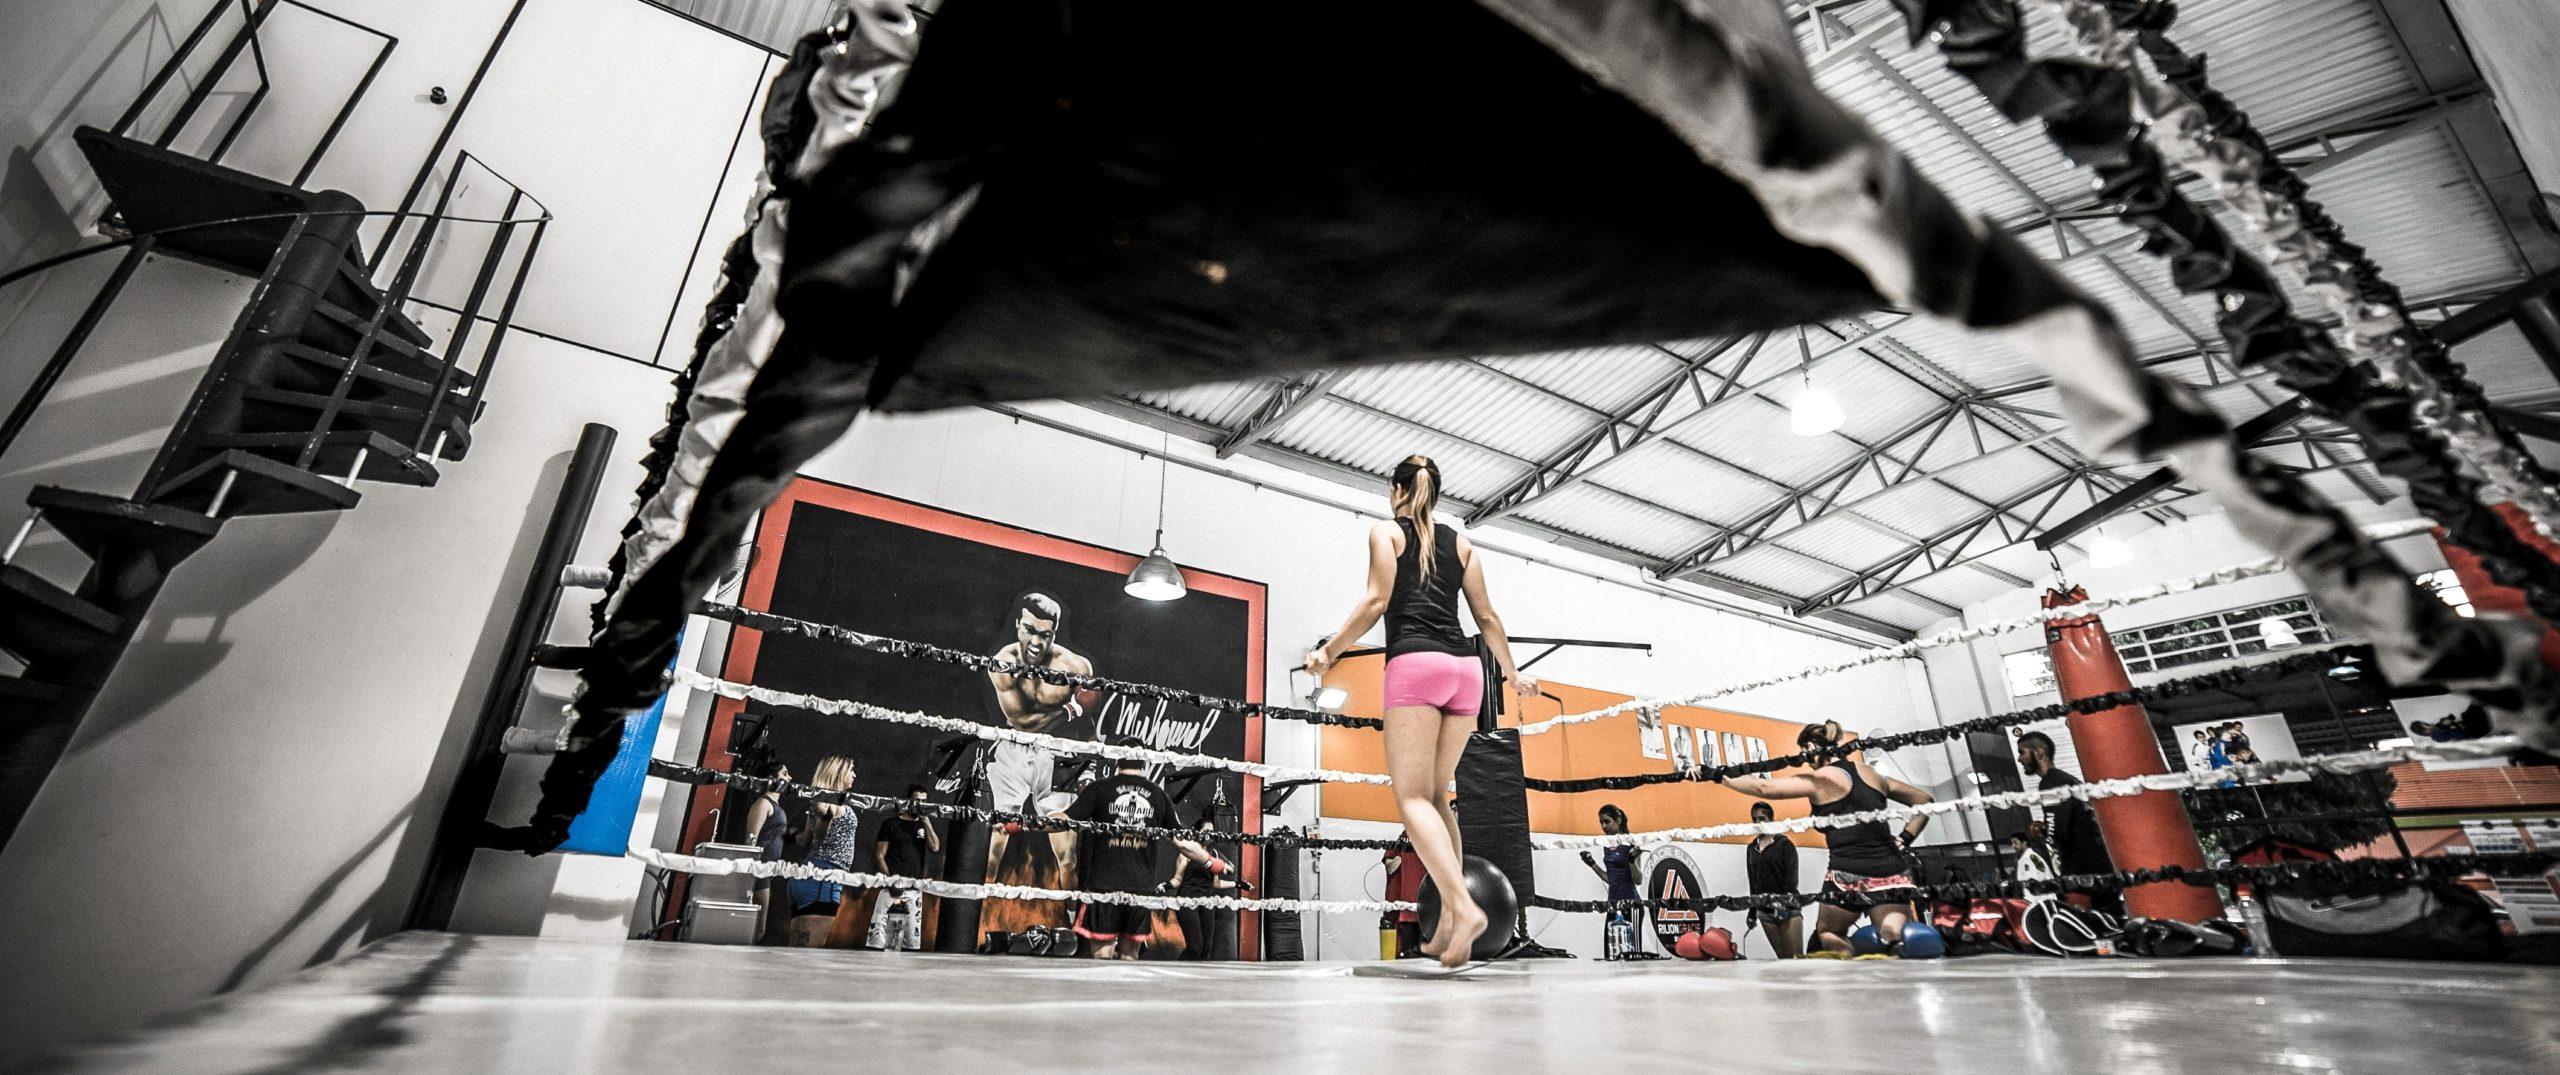 My Boxing Life